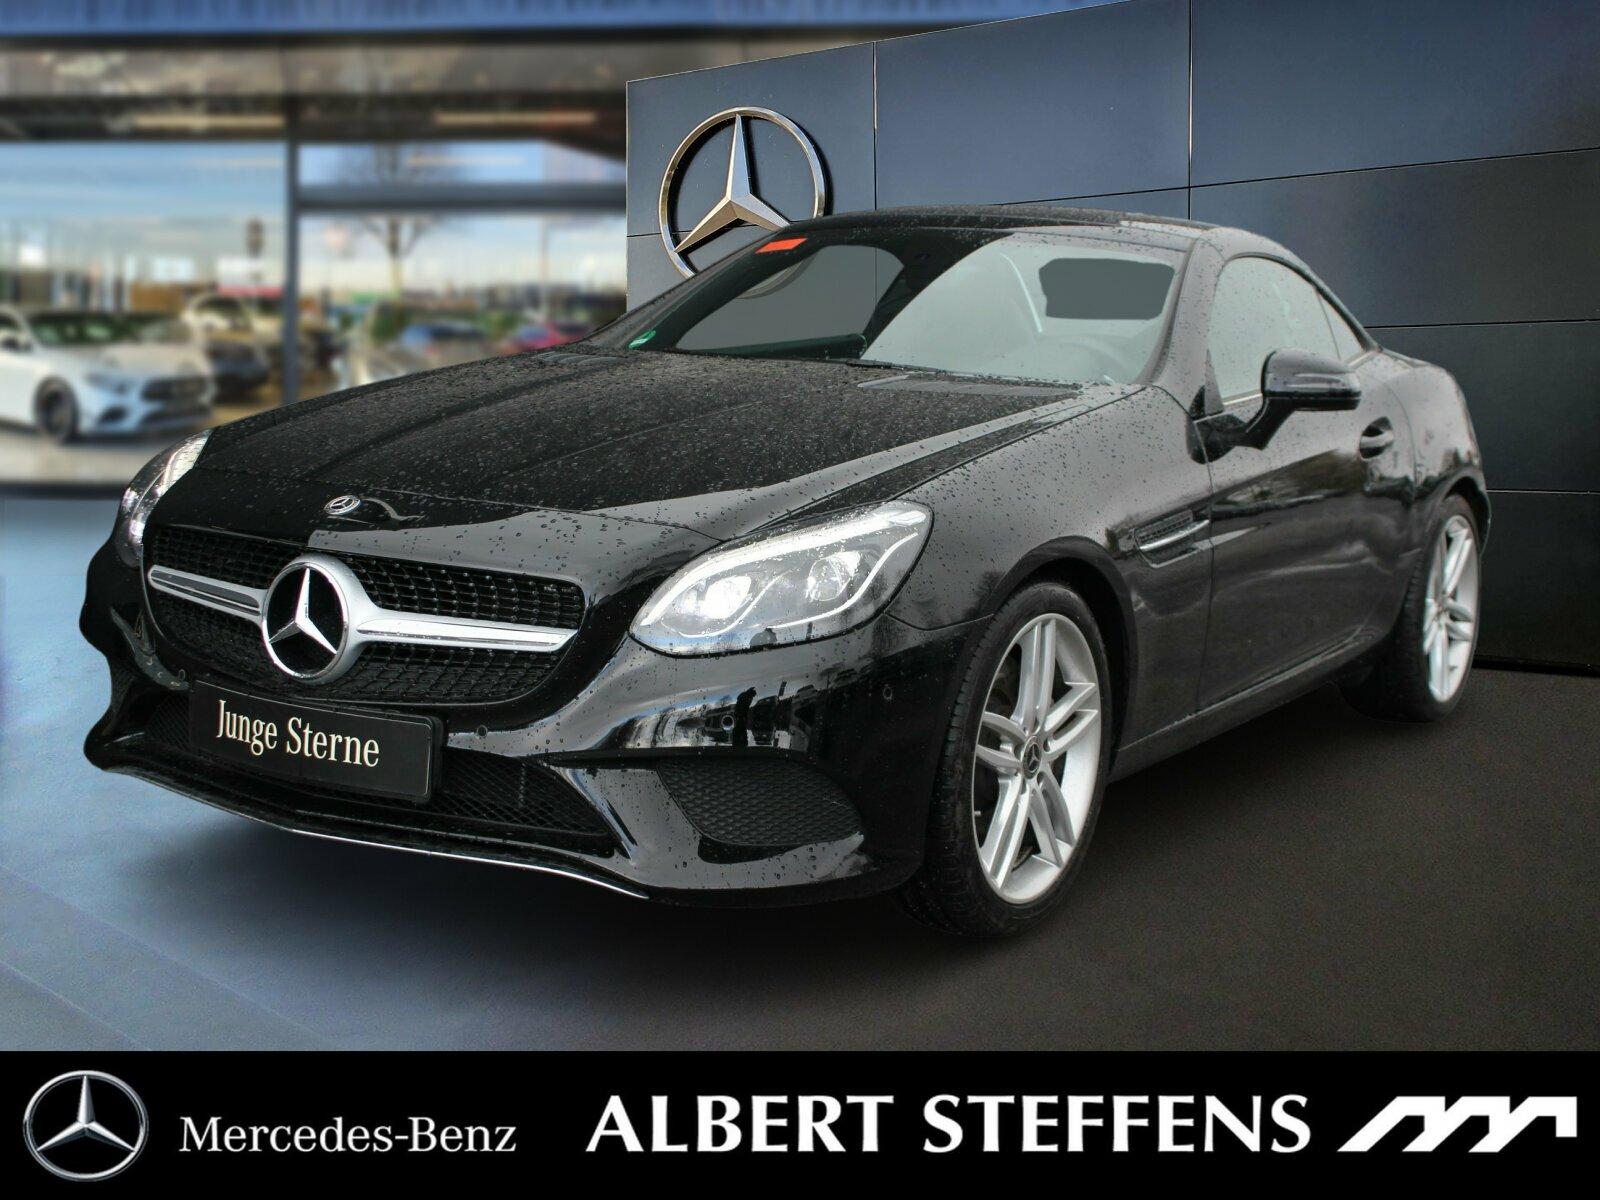 Mercedes-Benz SLC 180 AMG Airscarf+NAVI+Sitzheitung+Tempomat+, Jahr 2017, Benzin